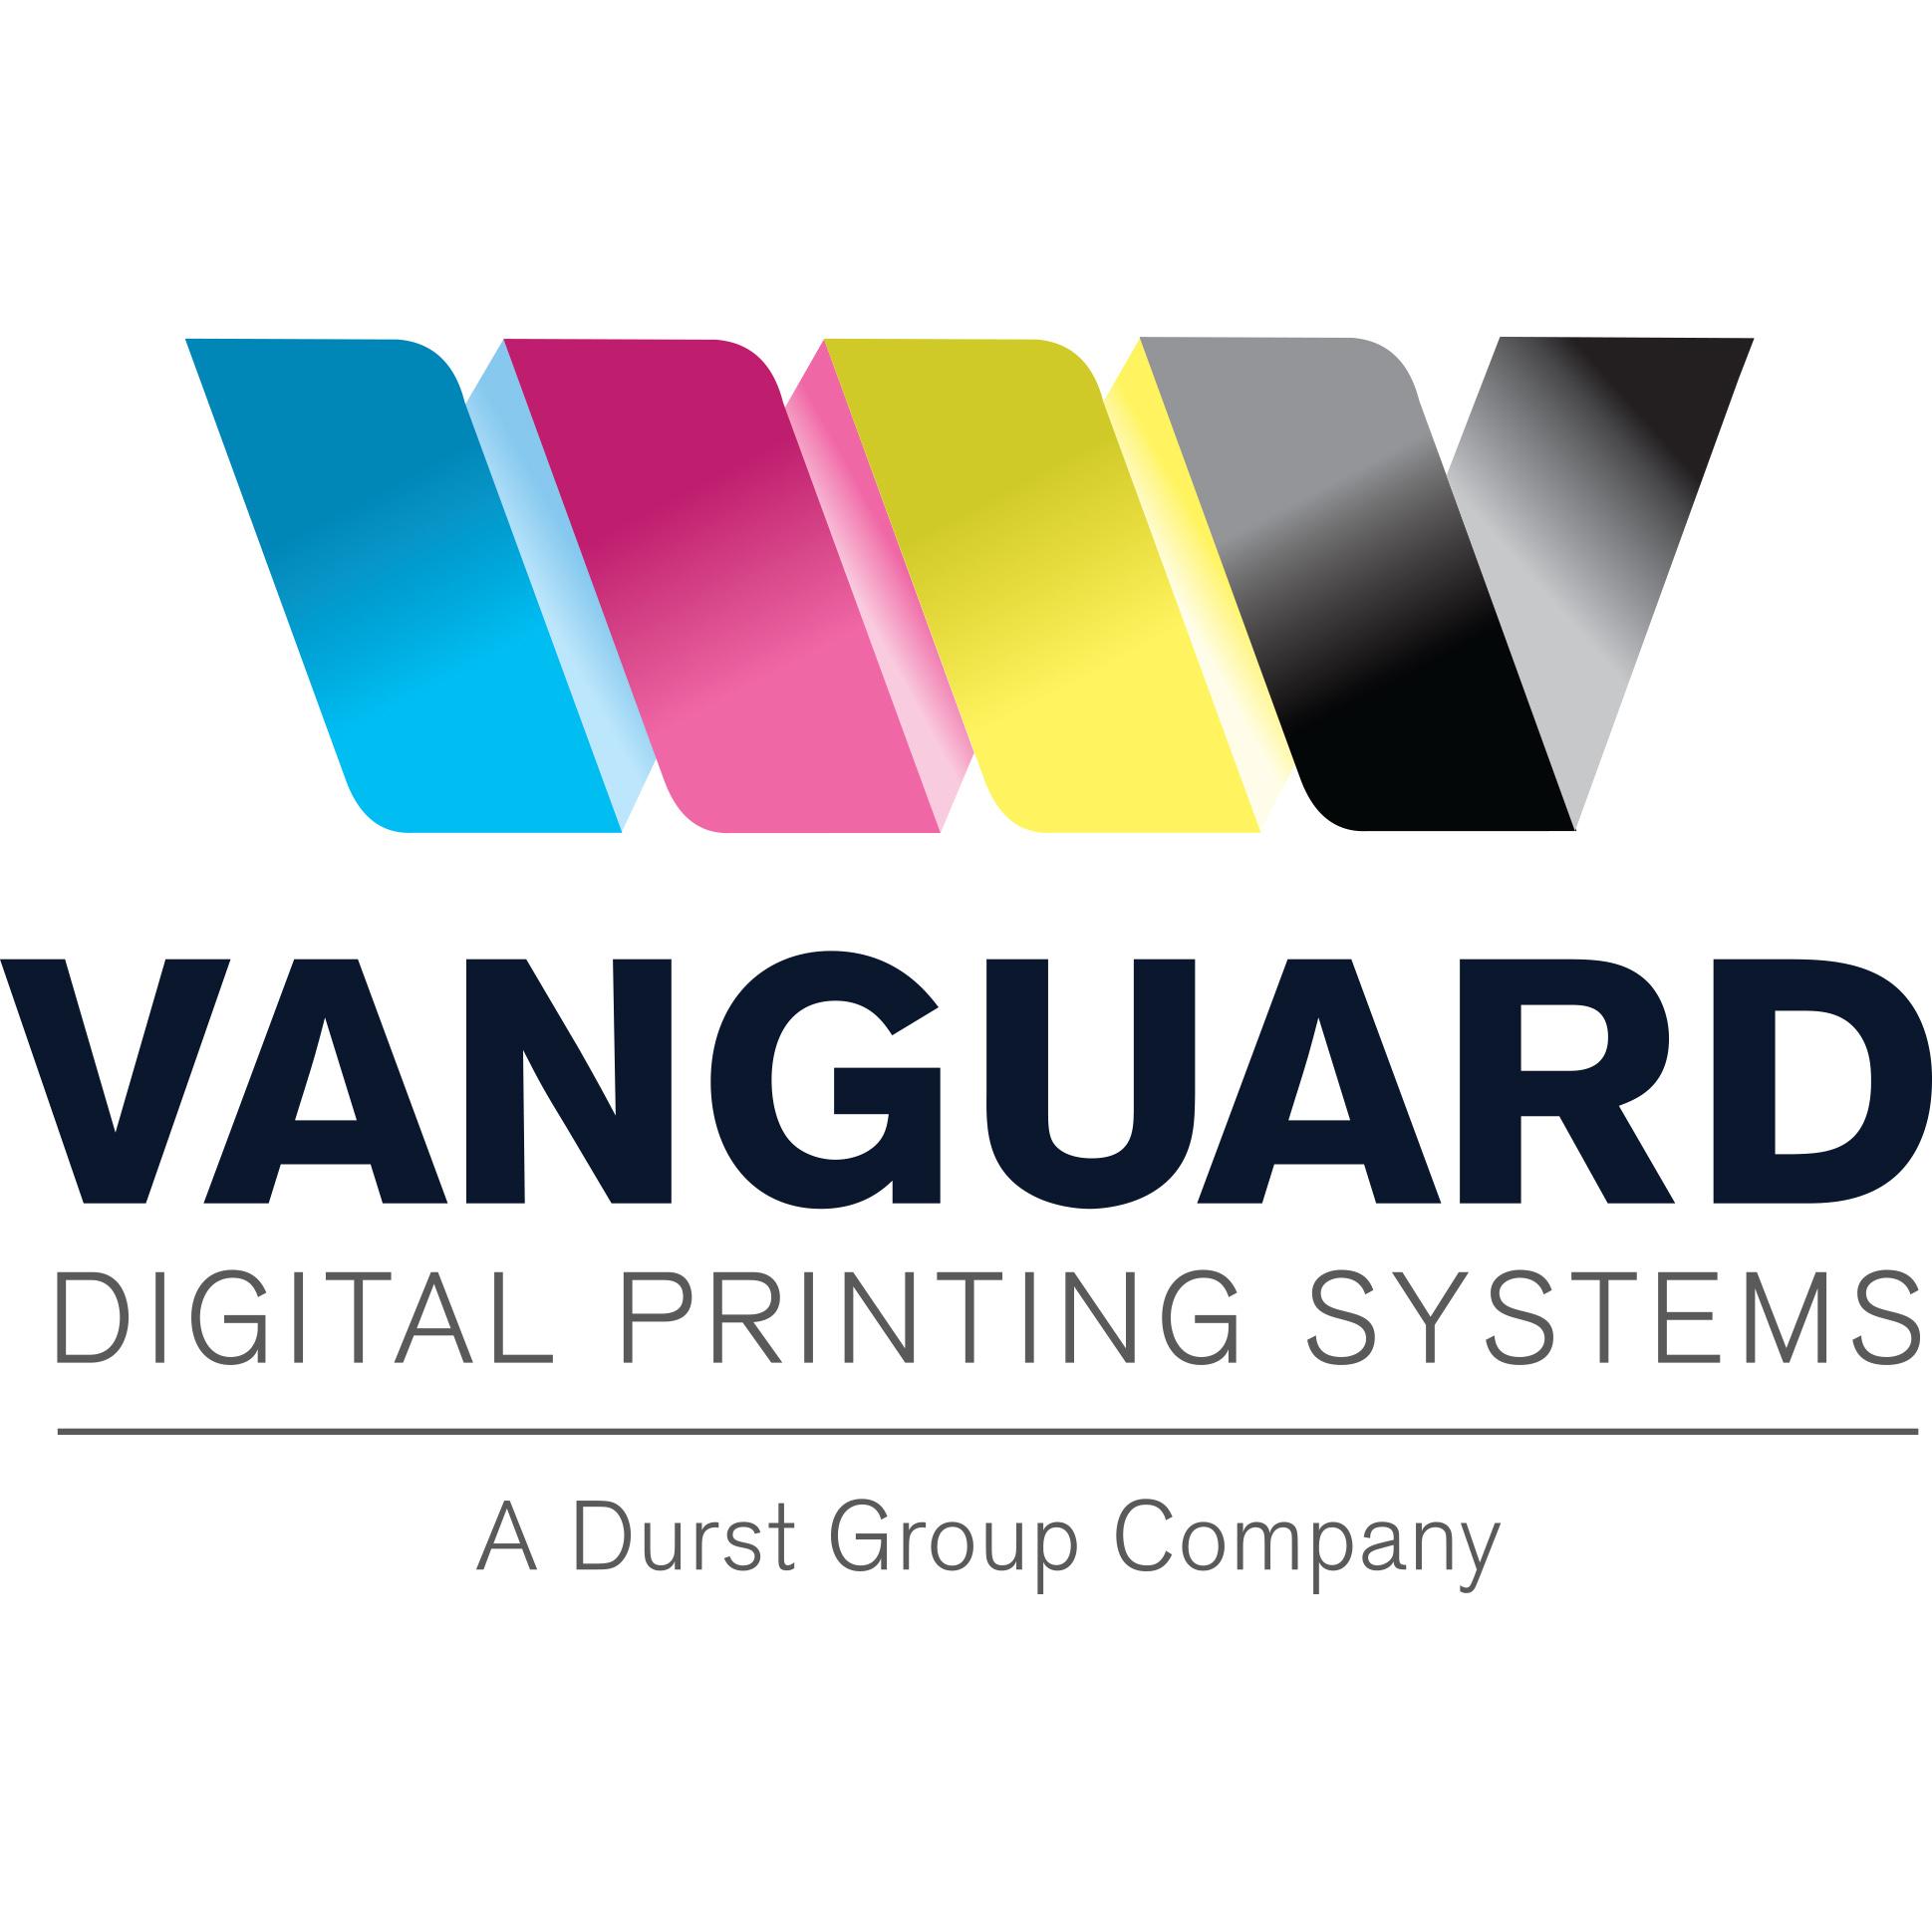 Vanguard Digital Printing Systems Durst logo